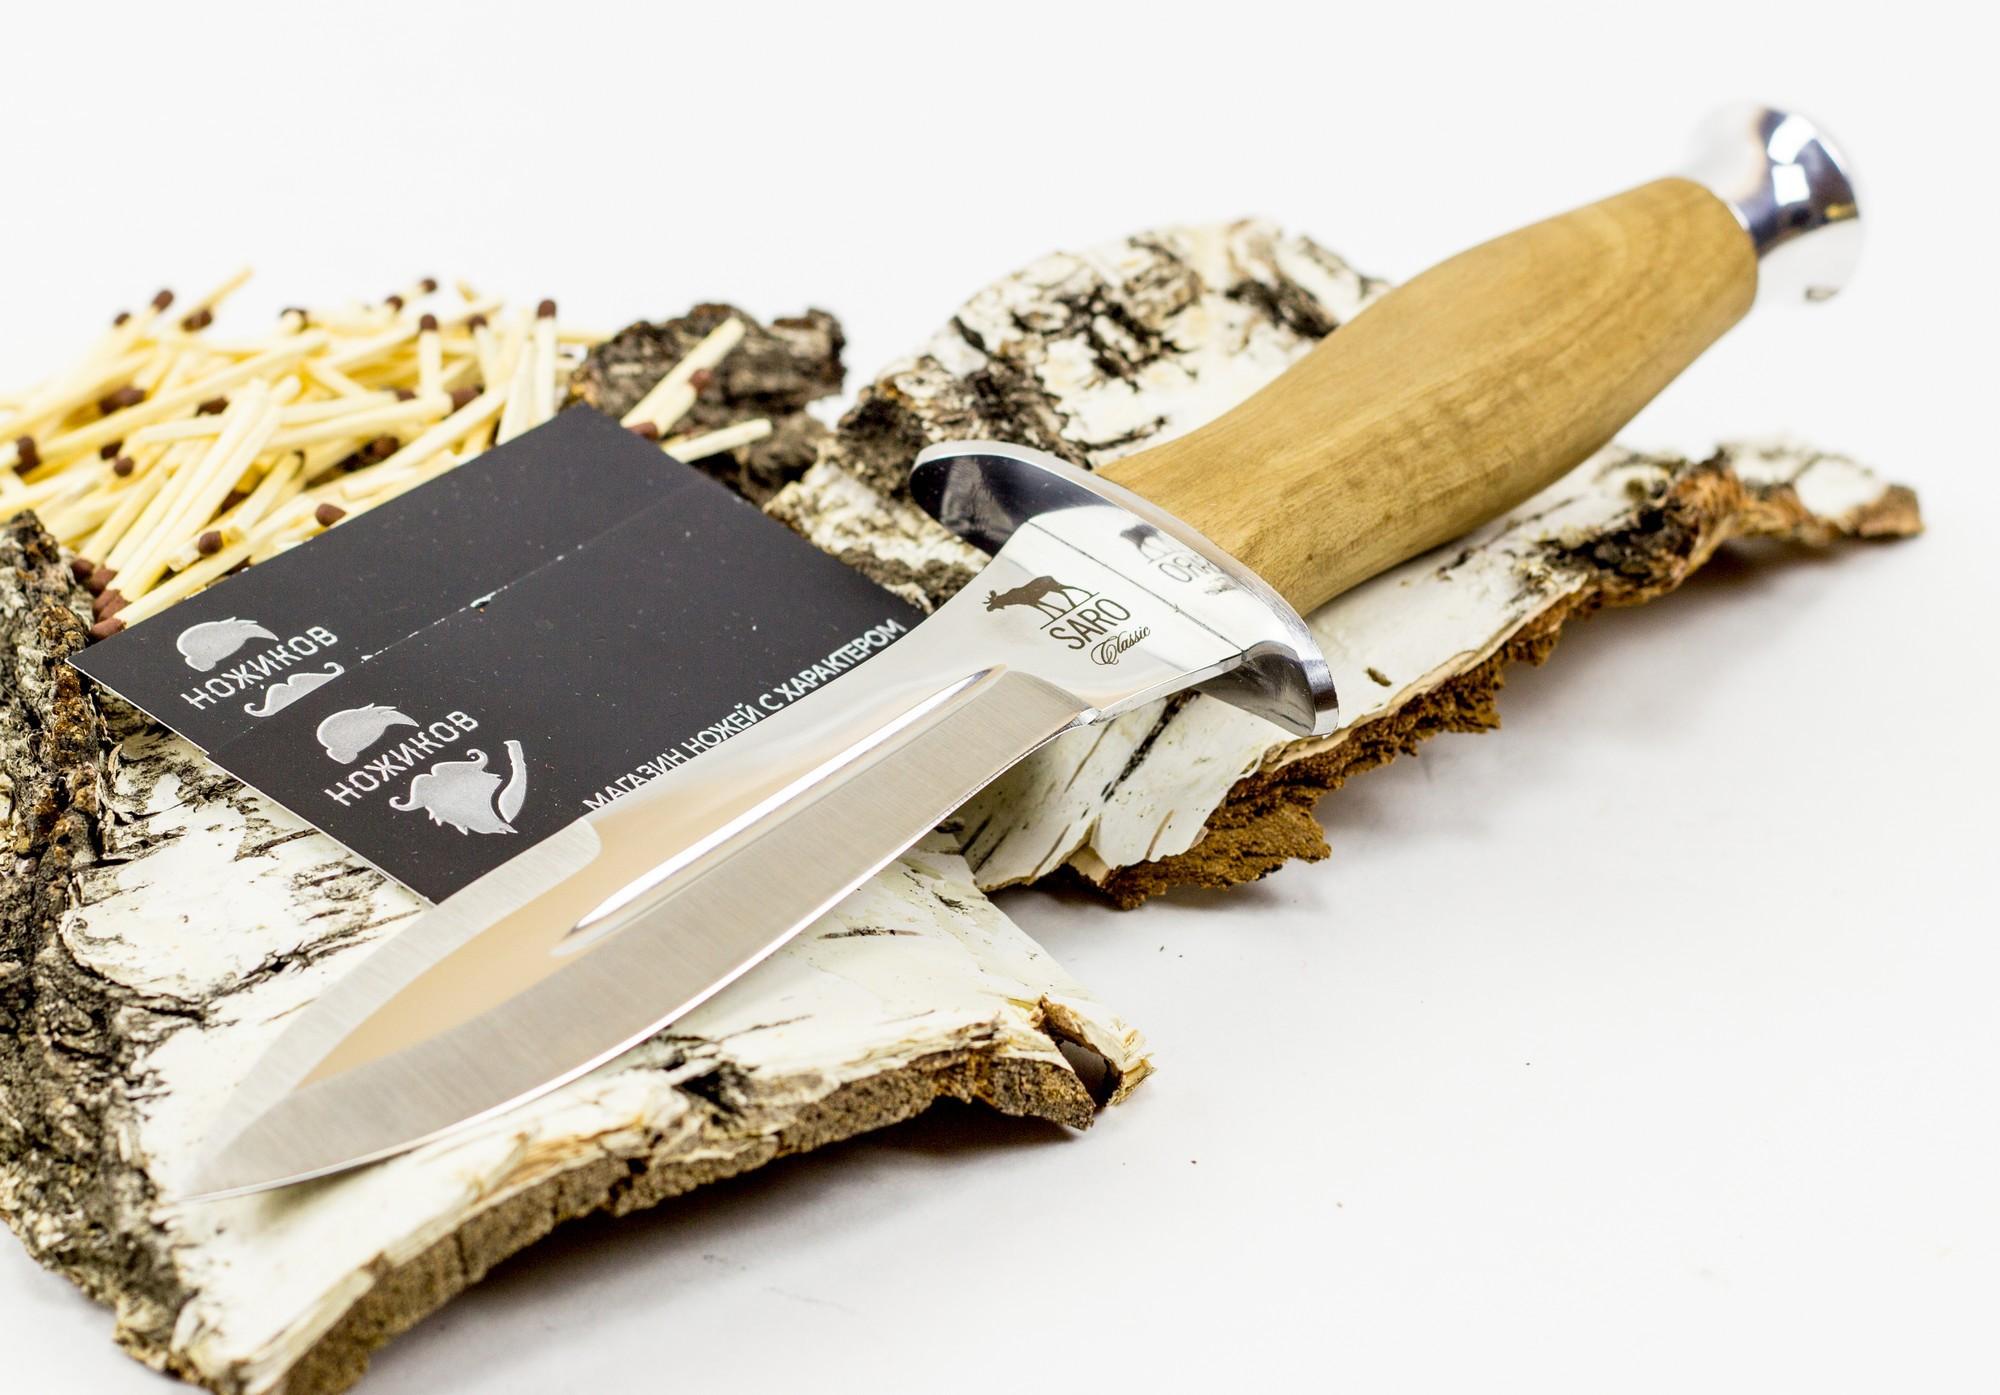 Фото 2 - Нож Кречет, дерево от САРО